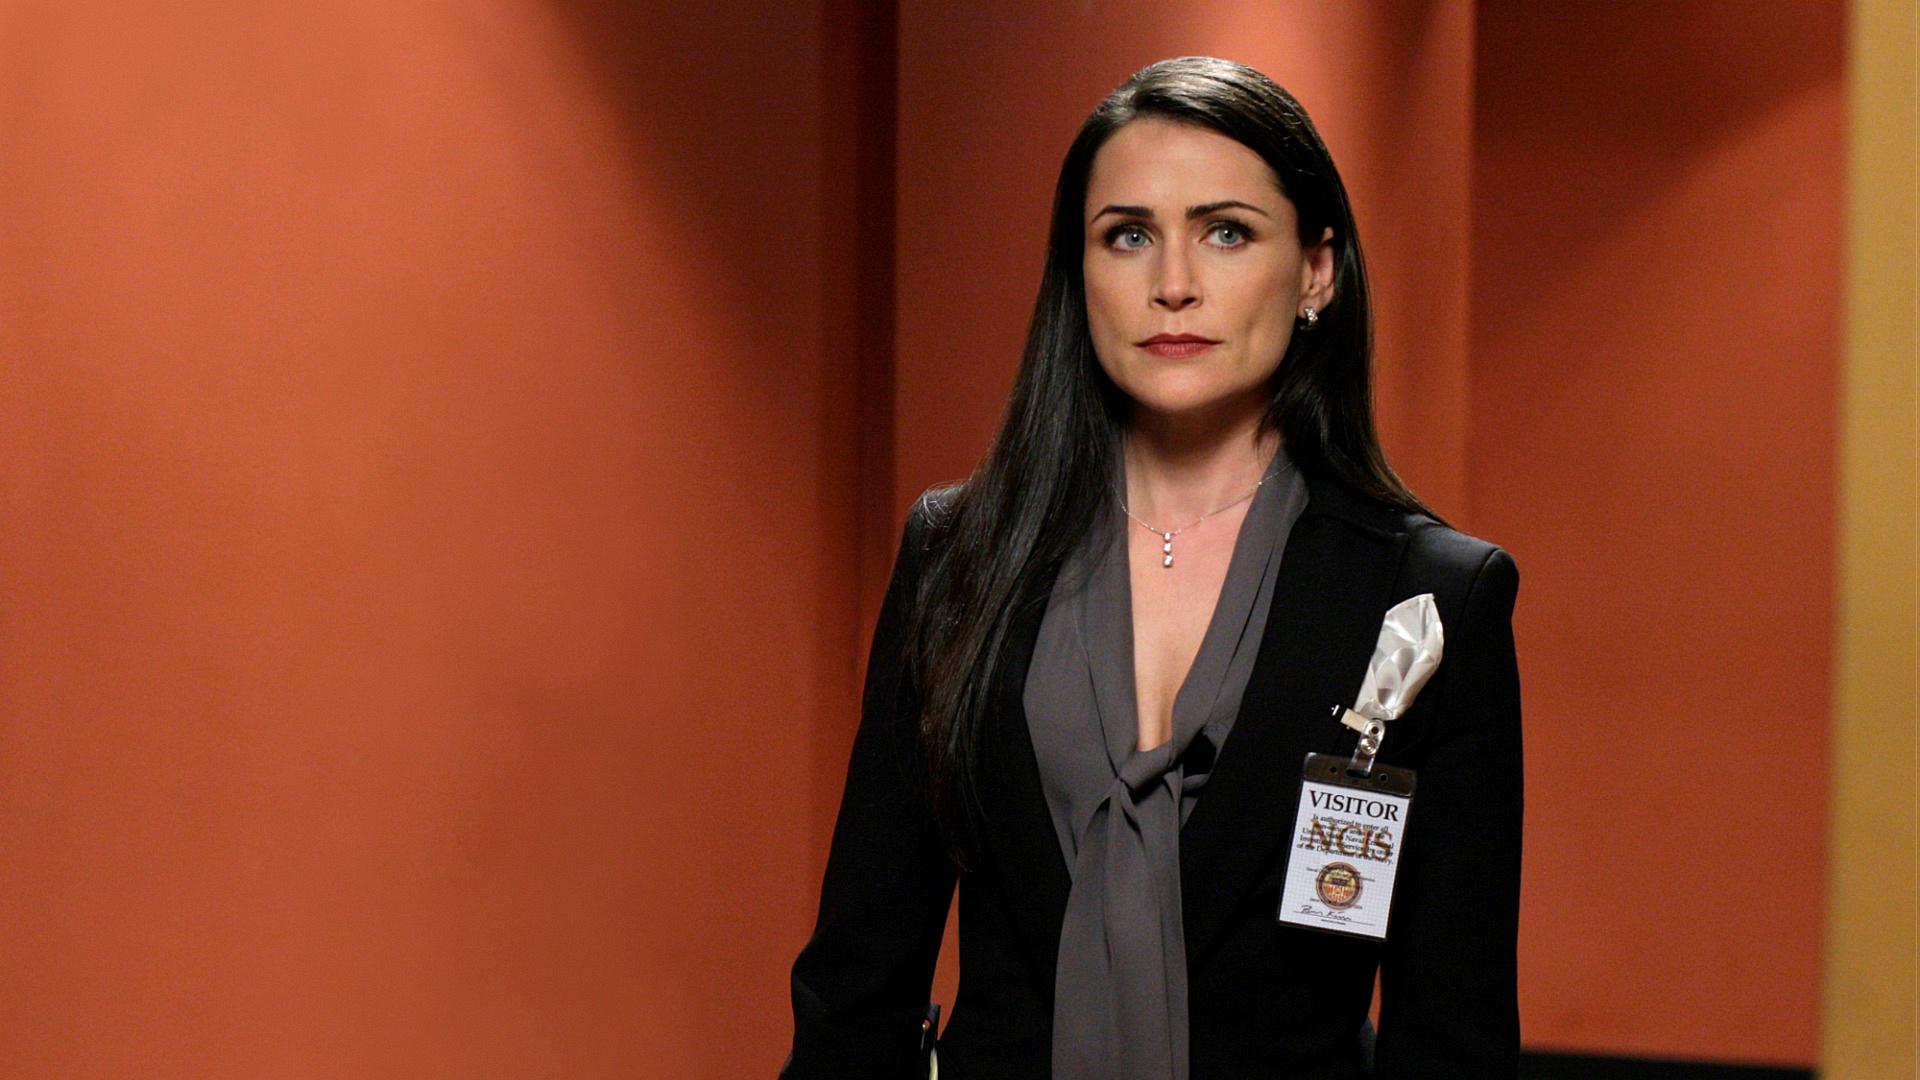 Rena Sofer ncis episodes